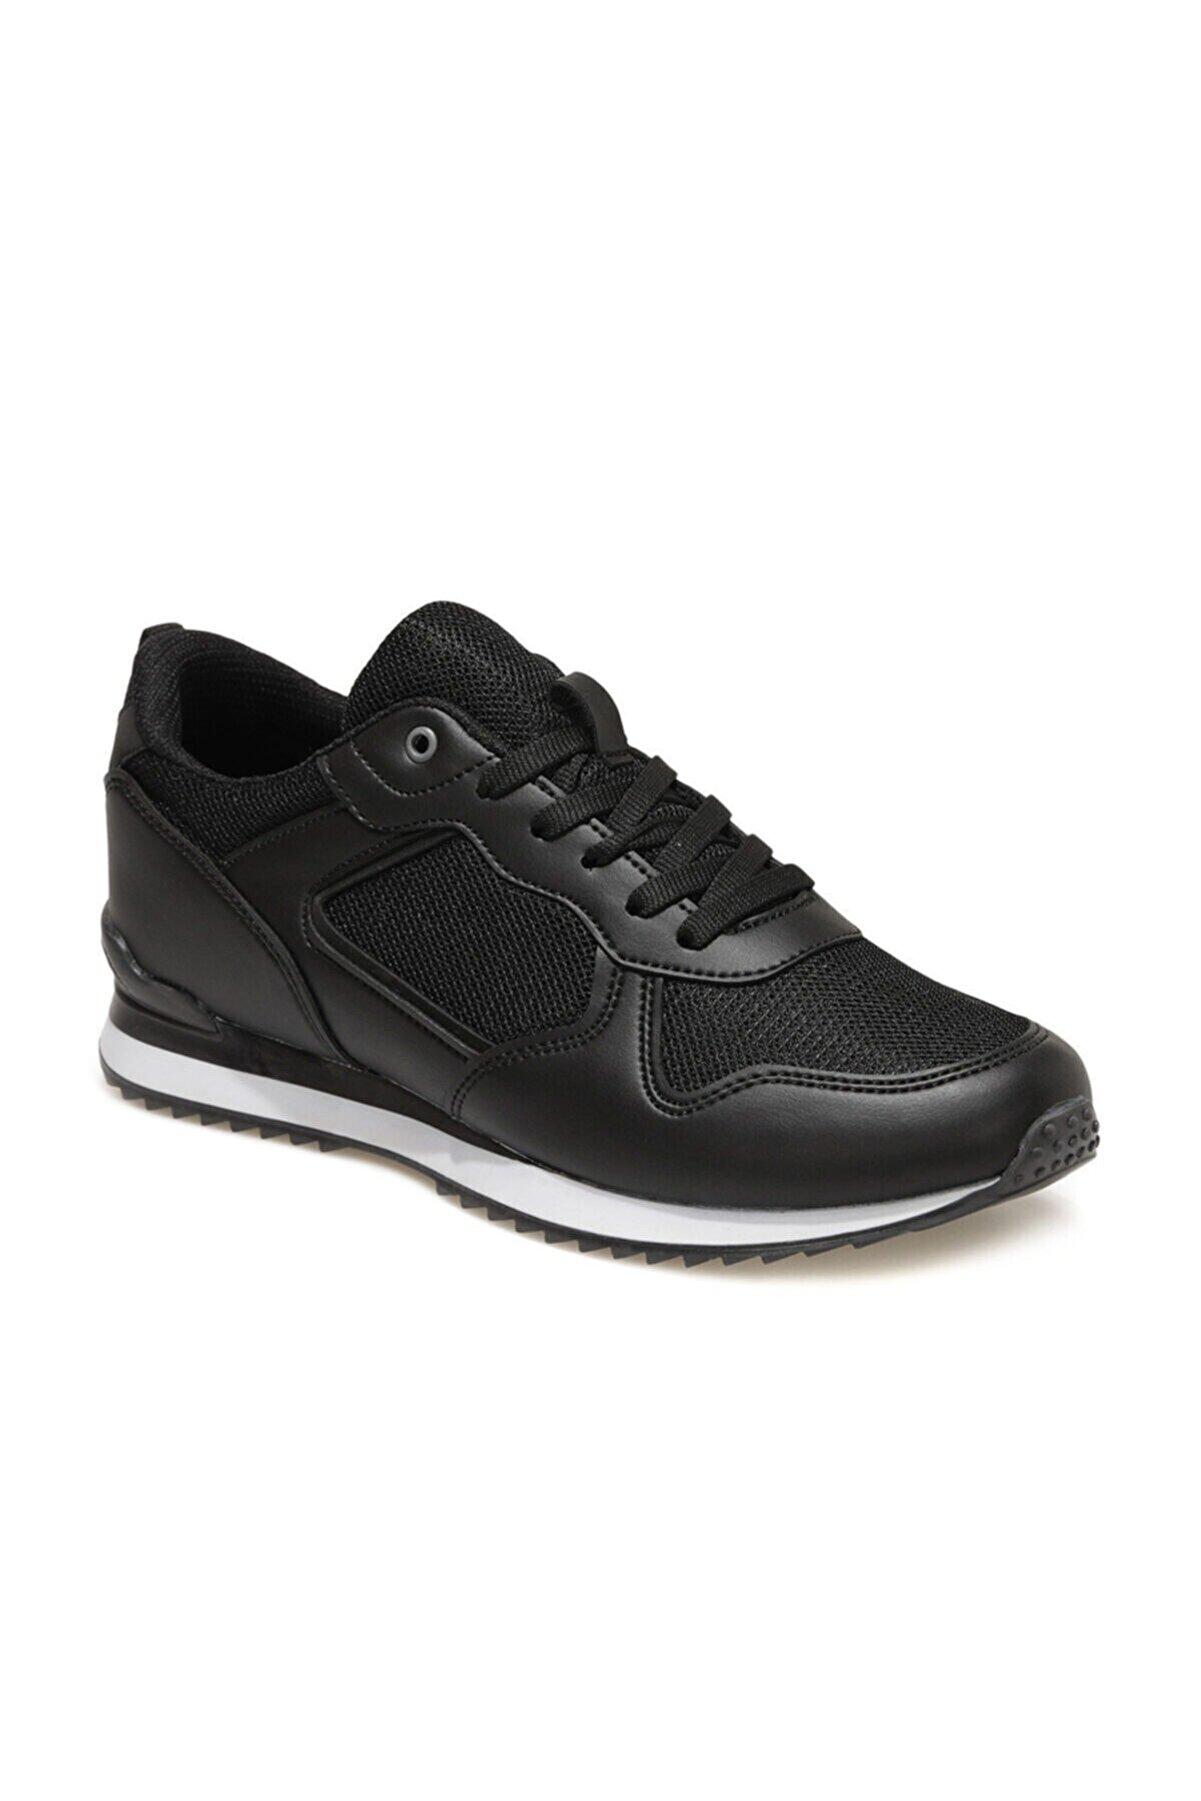 Torex Strada 1fx Siyah Erkek Casual Ayakkabı